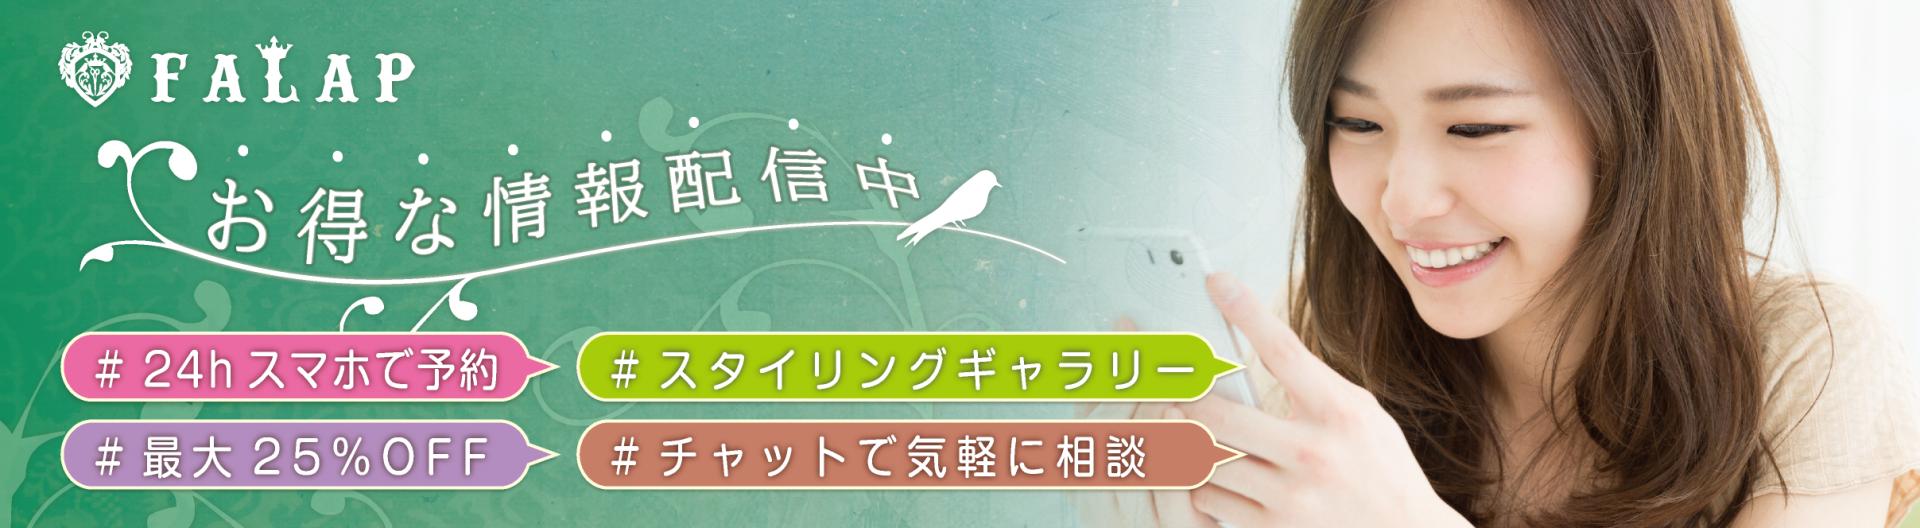 FALAPアプリ